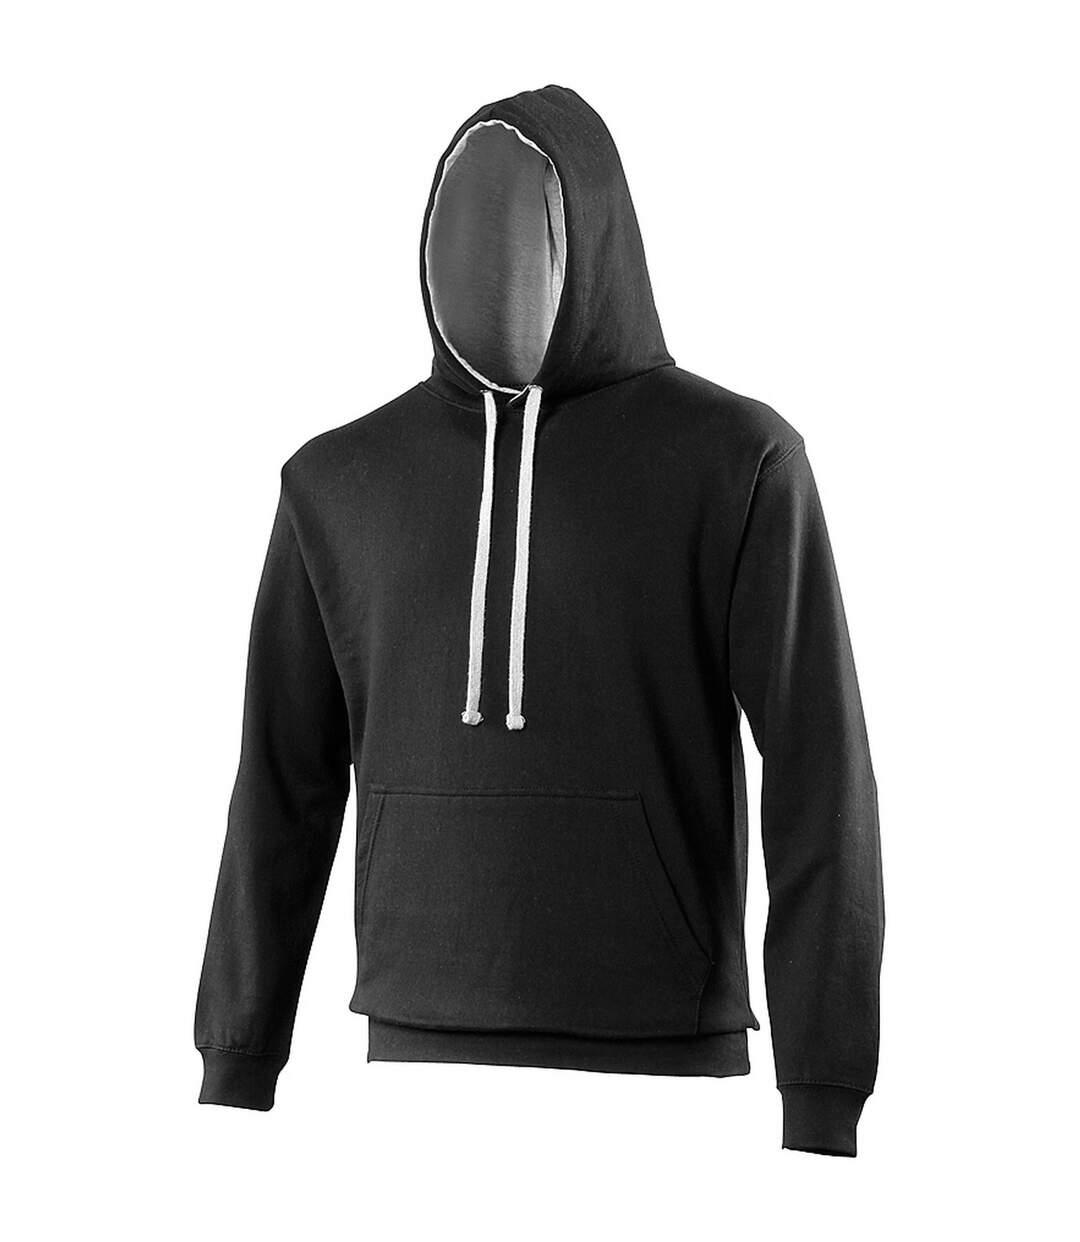 Awdis Varsity Hooded Sweatshirt / Hoodie (Arctic White / Hot Pink) - UTRW165